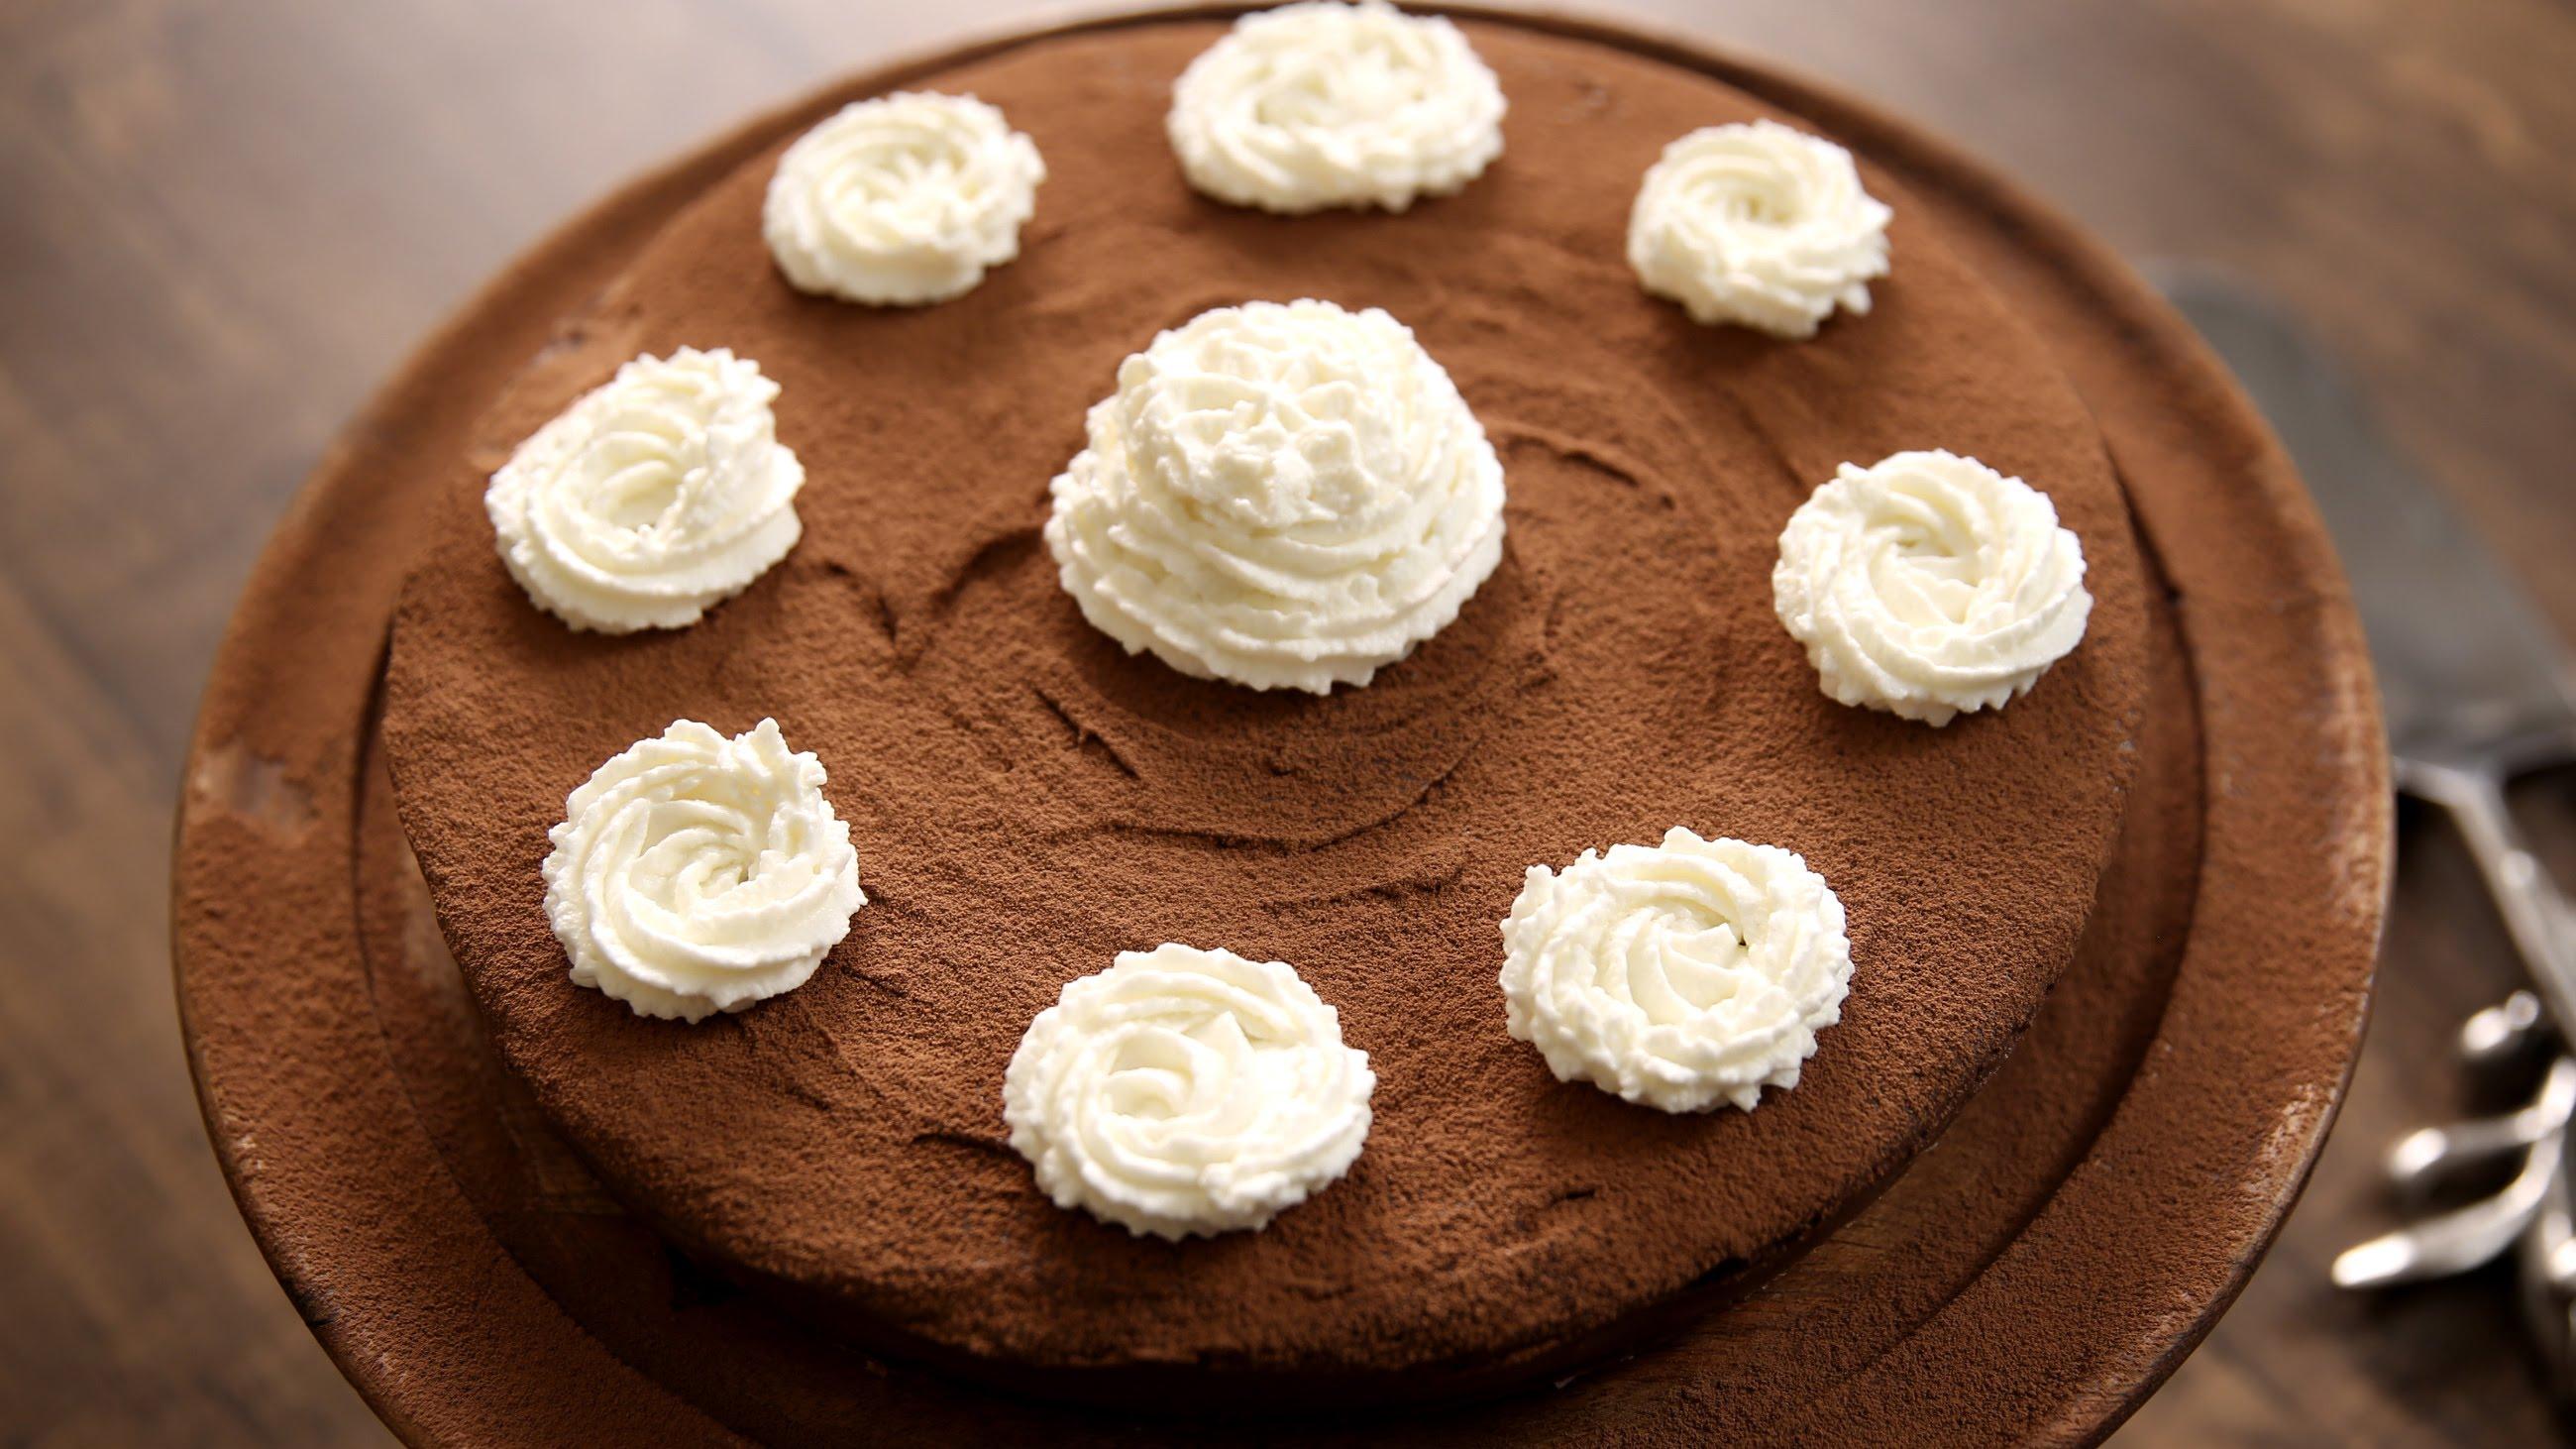 Pastry Cake Recipe In Malayalam: No Bake Cheesecake Recipe